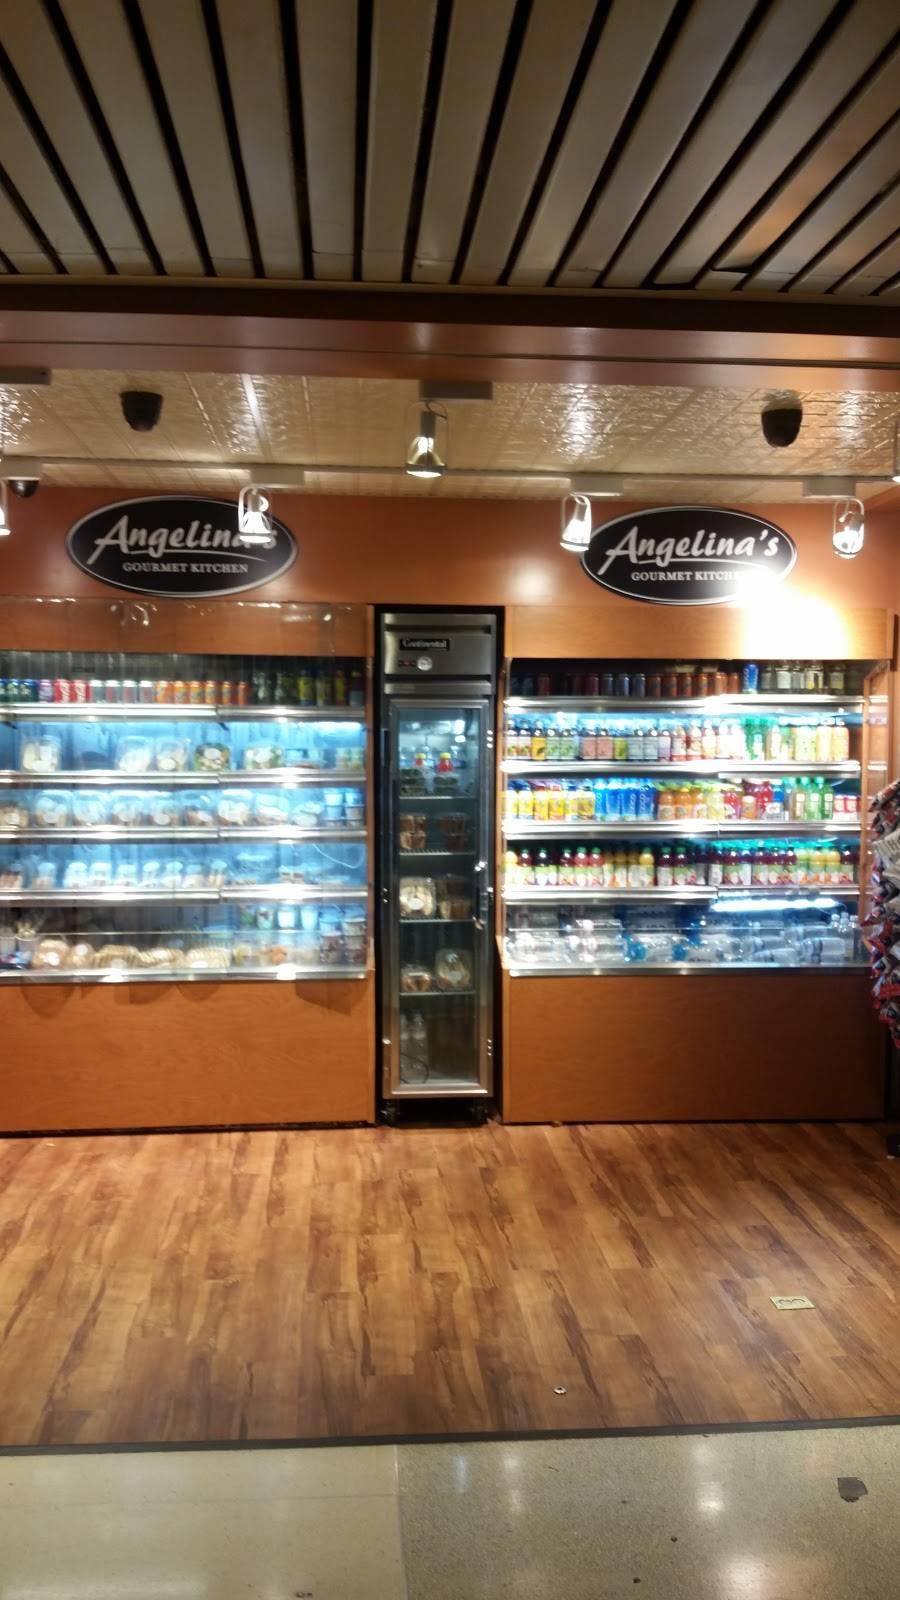 Angelinas Gourmet Kitchen | restaurant | East Elmhurst, NY 11371, USA